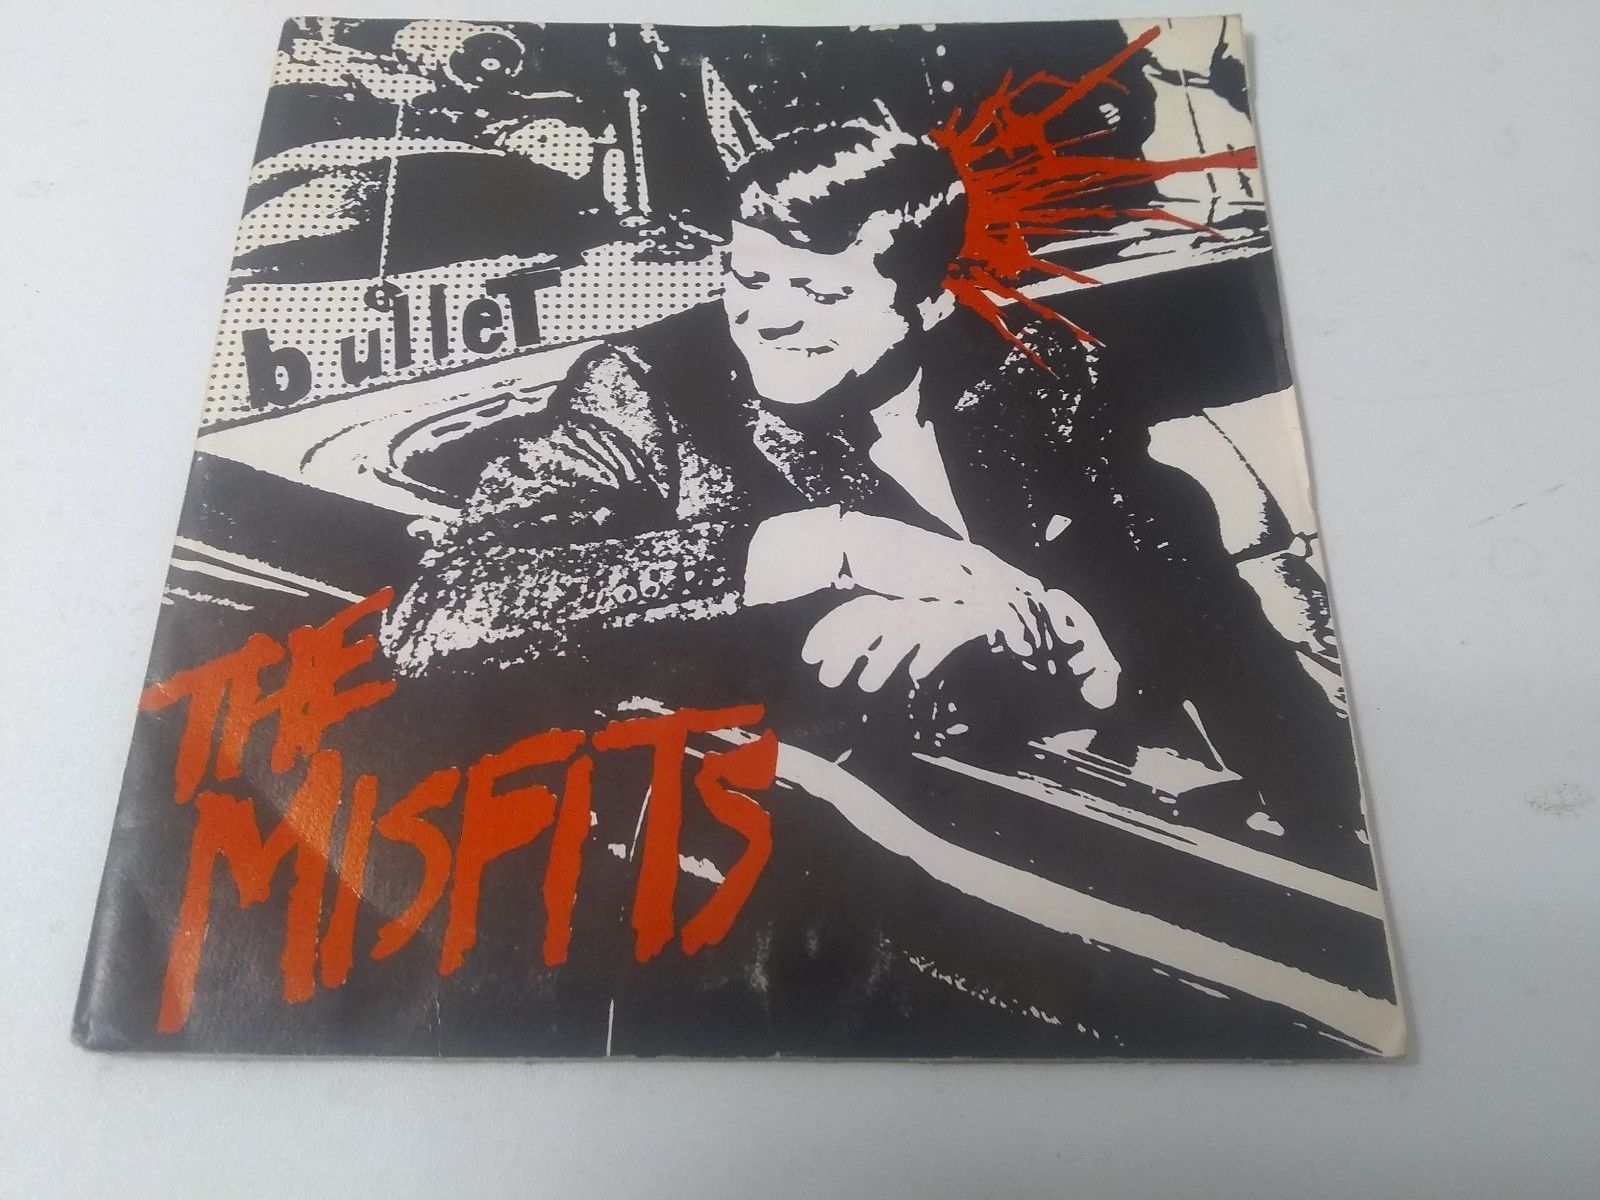 The Misfits-Bullet 7' Red Vinyl EP